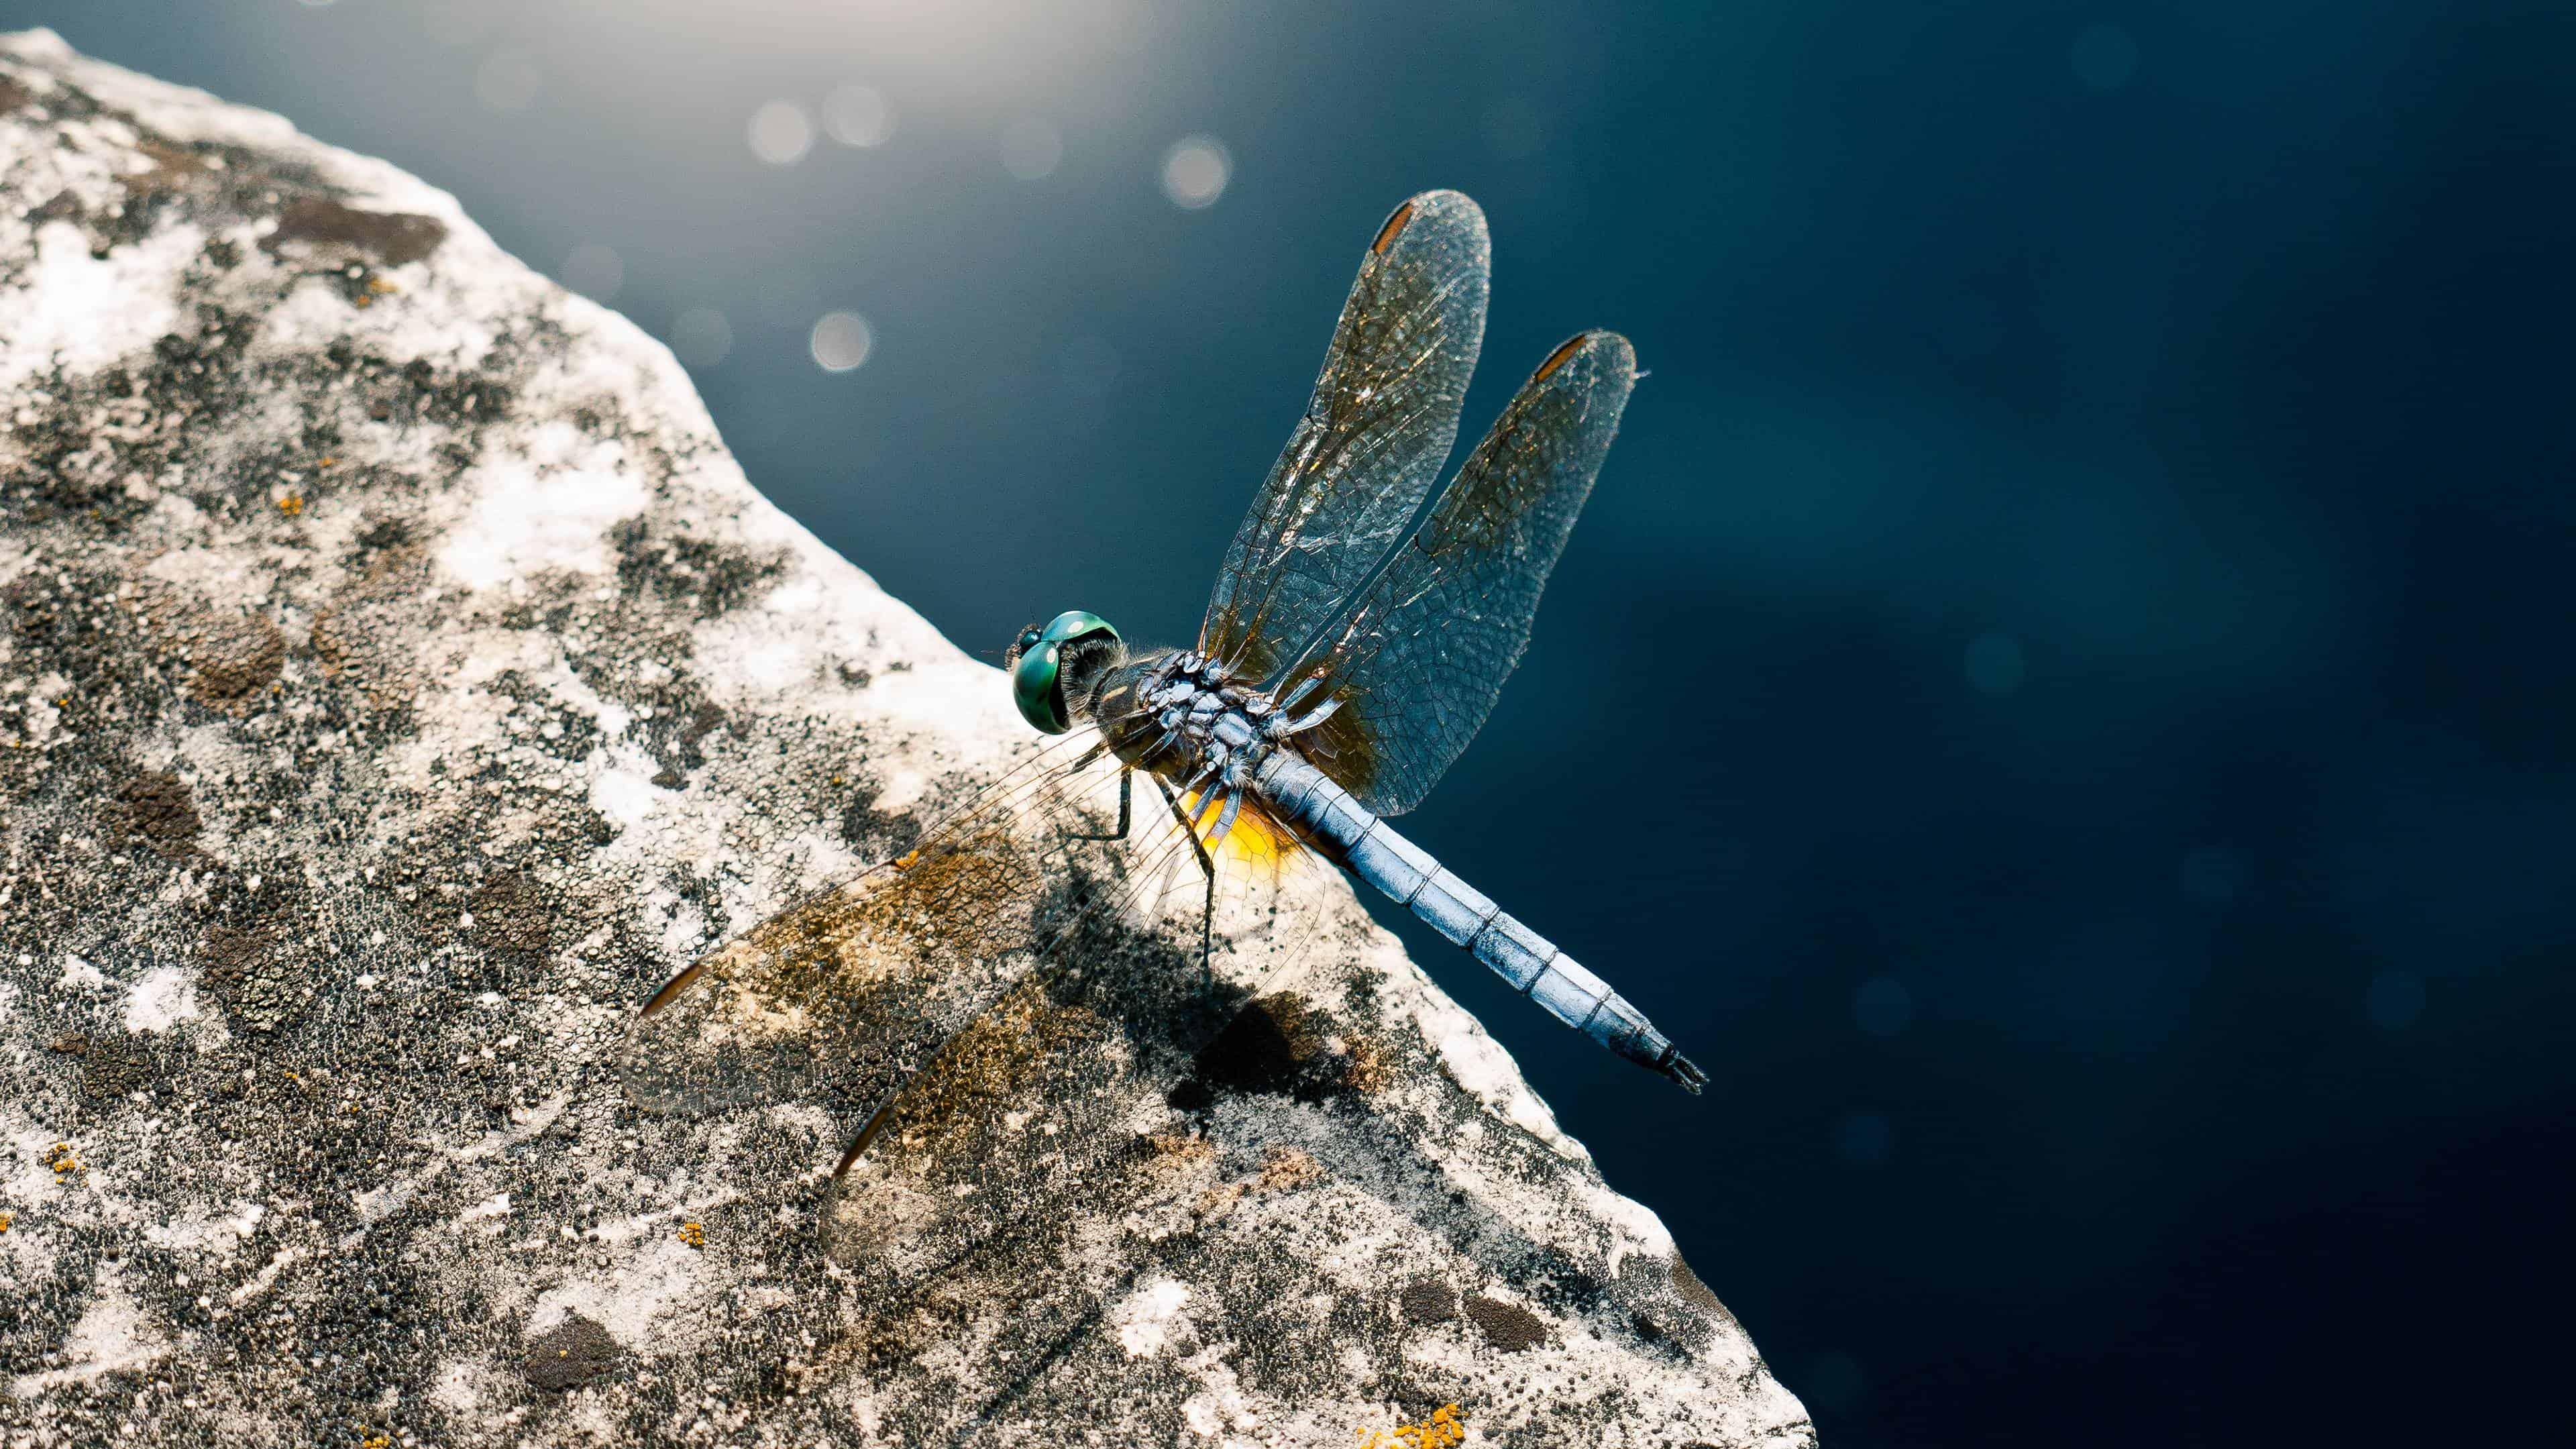 Dragonfly uhd 4k wallpaper pixelz - 4k wallpaper download ...